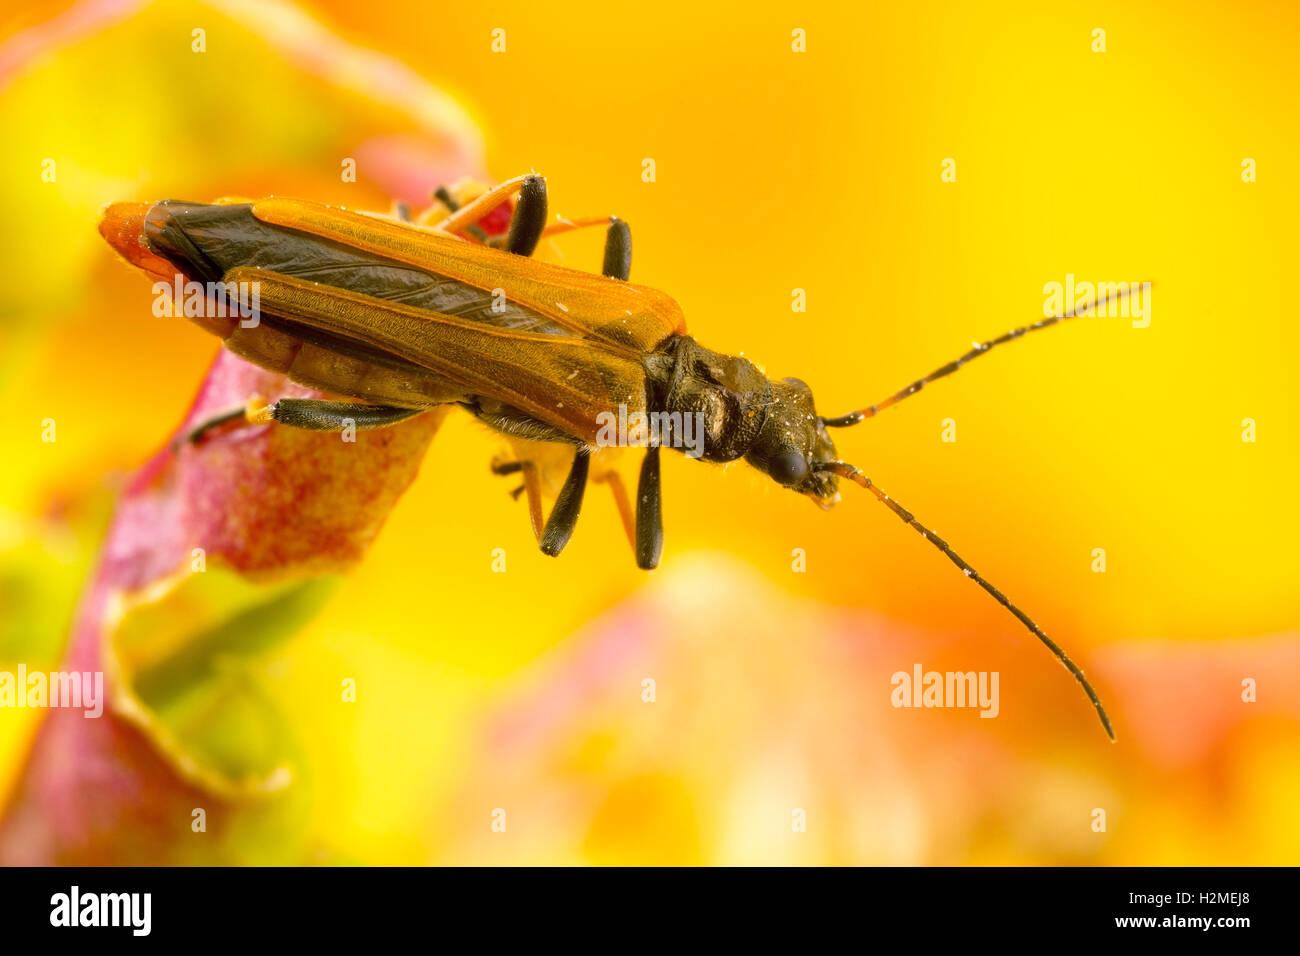 Tiny beetle on wild plants - Stock Image